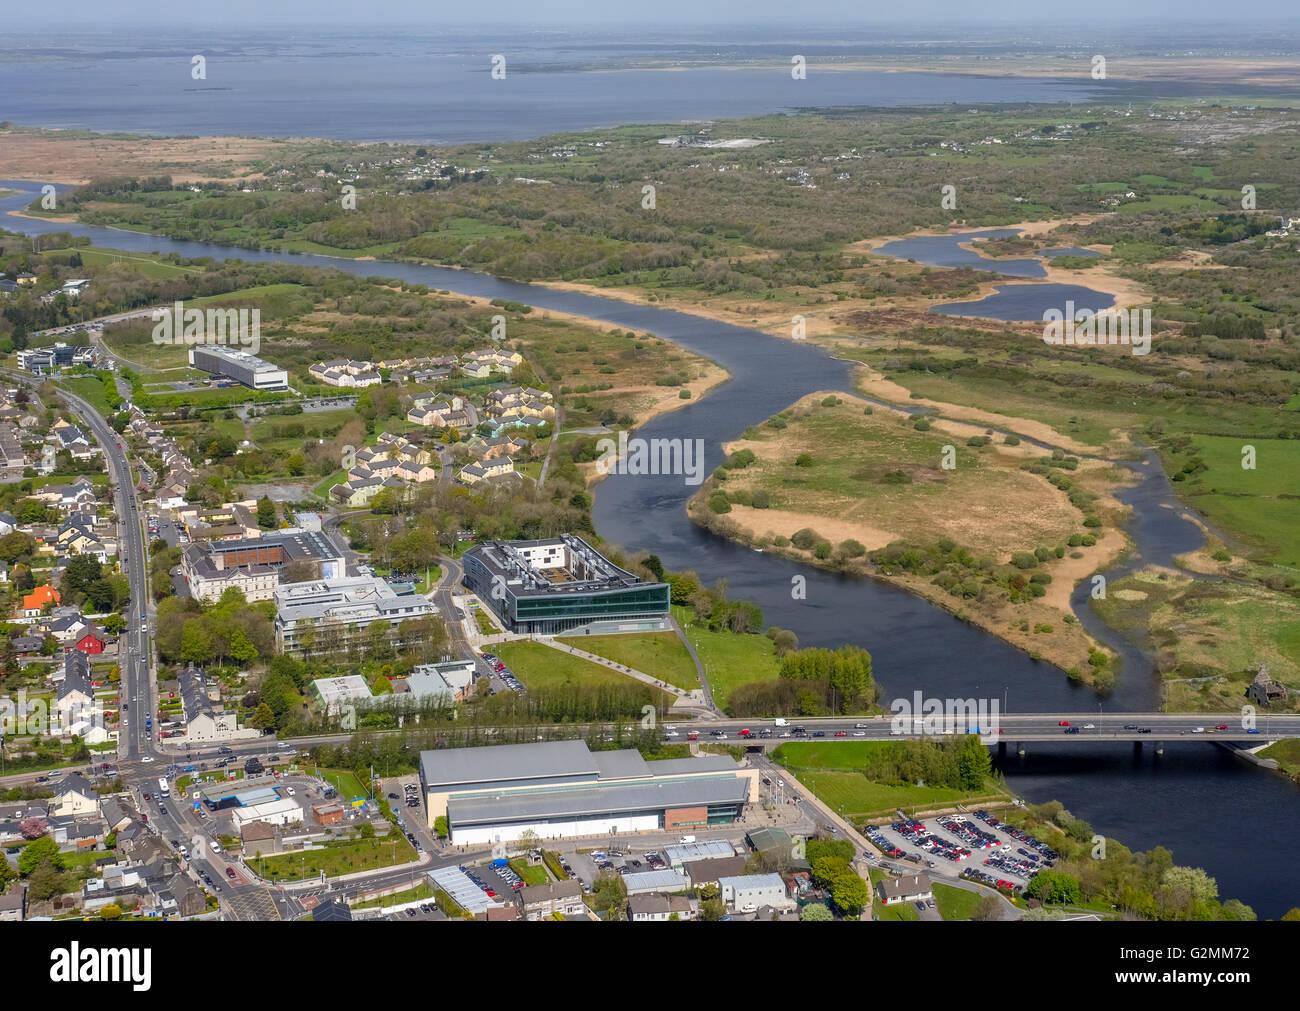 Aerial view, School of Nursing, University of Galway, University of Galway, Galway, Galway, COUNTY CLARE, Galway, - Stock Image